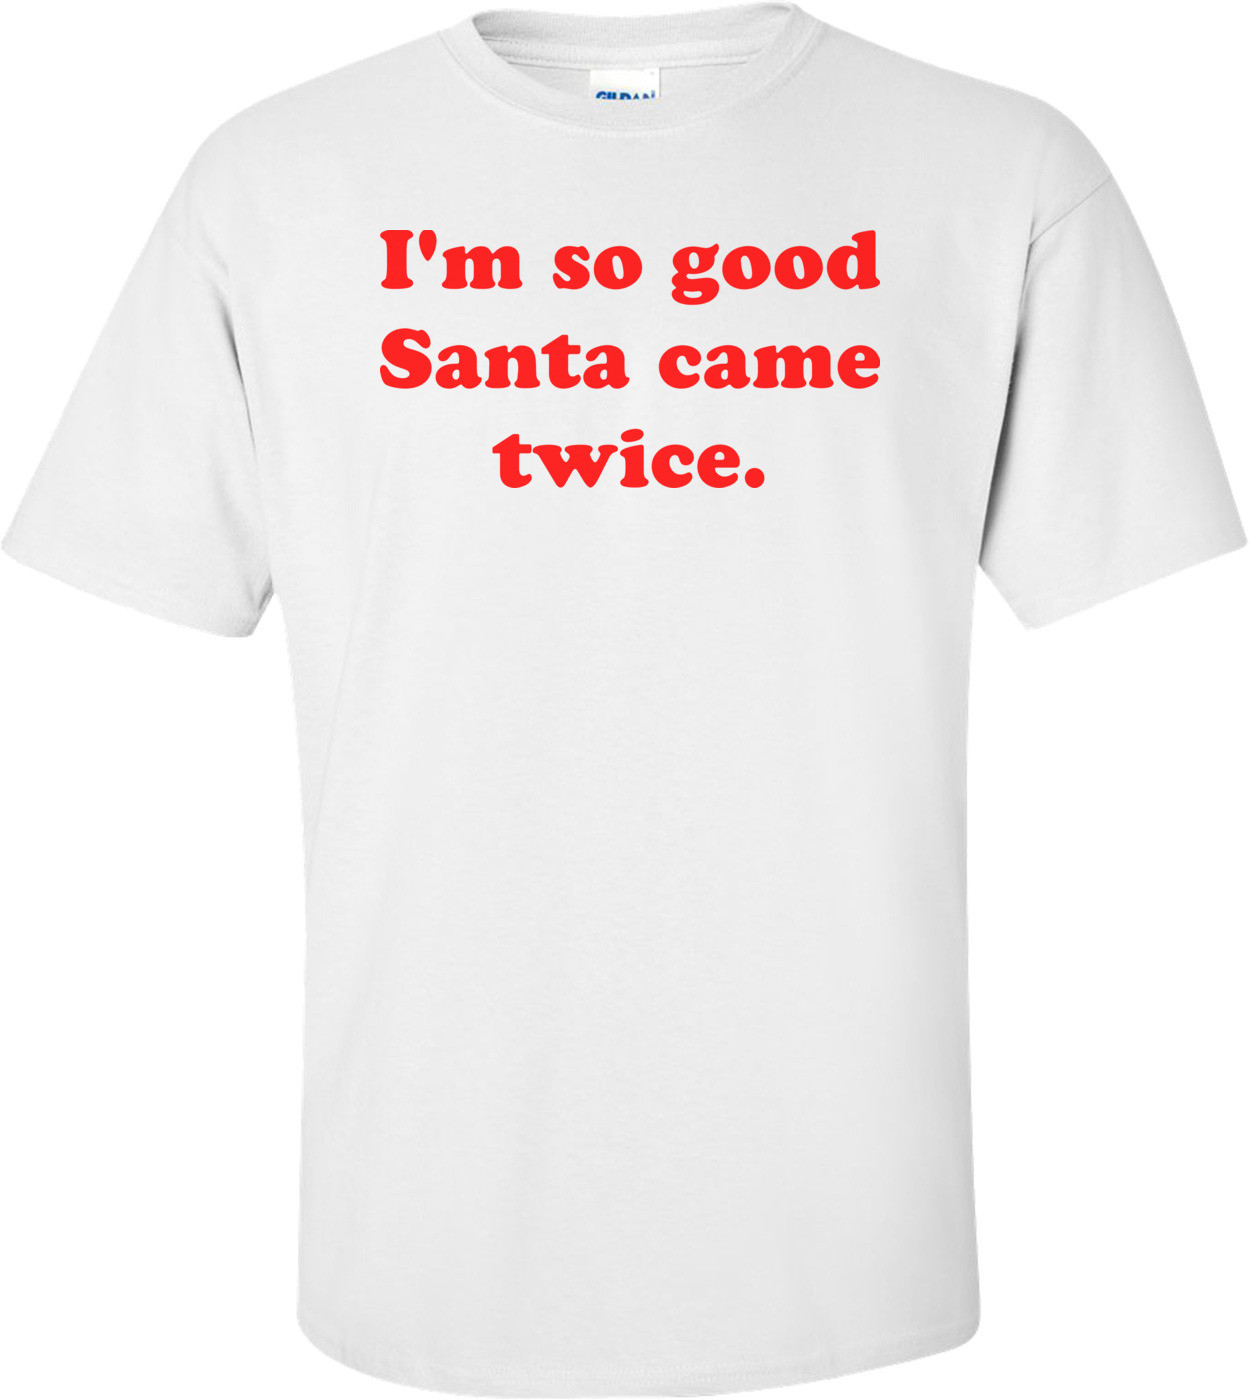 I'm So Good Santa Came Twice. Shirt